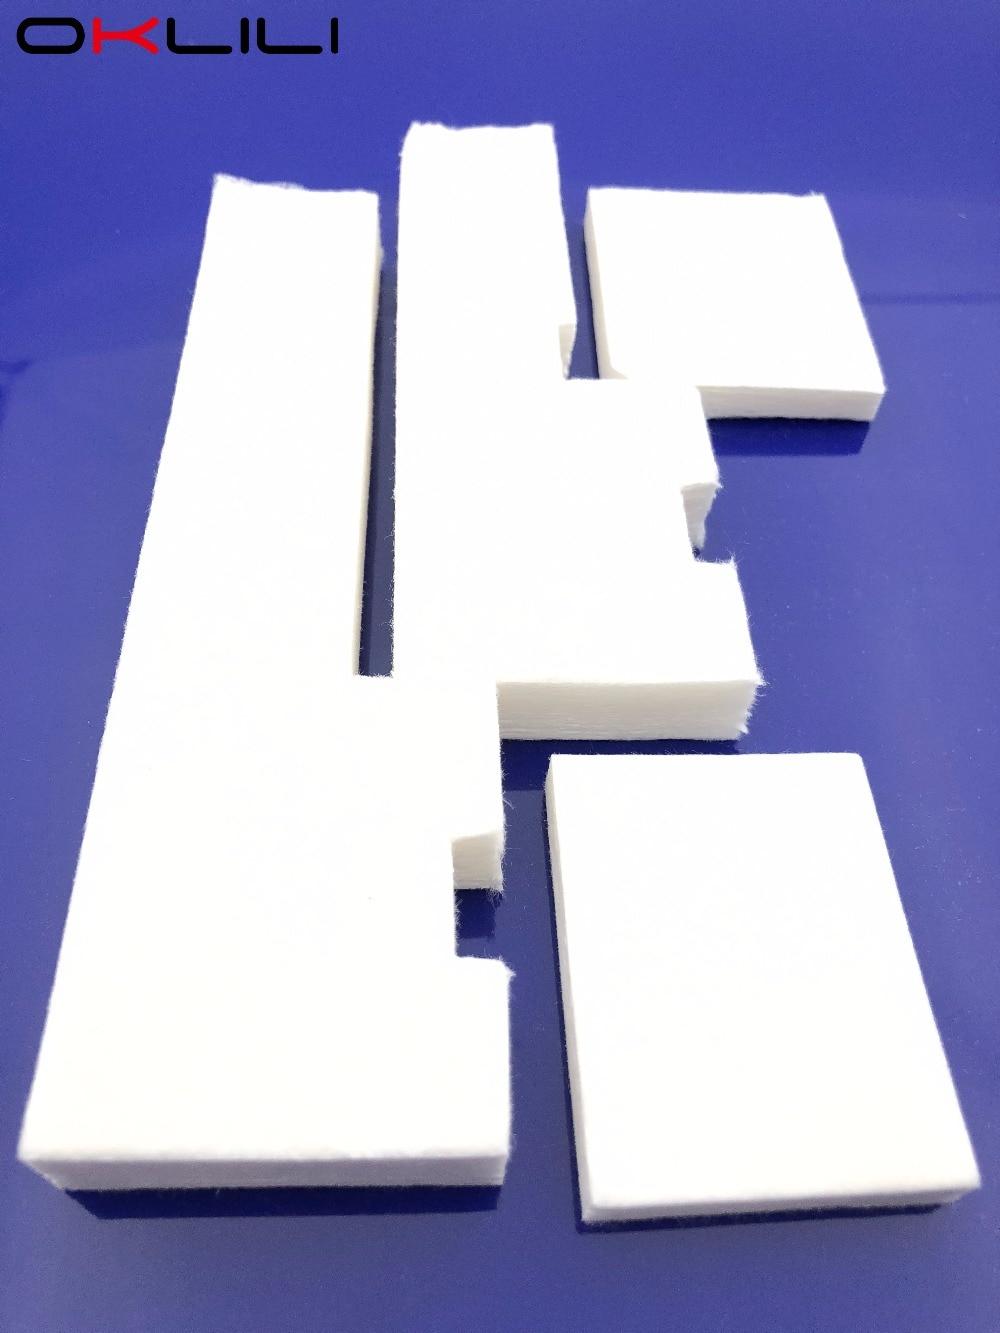 Printer Parts Printer Supplies Original New Waste Ink Tank Pad Sponge For Epson R280 R290 P50 P60 T50 T60 A50 Tx650 R285 L800 L801 R330 L805 Easy To Repair